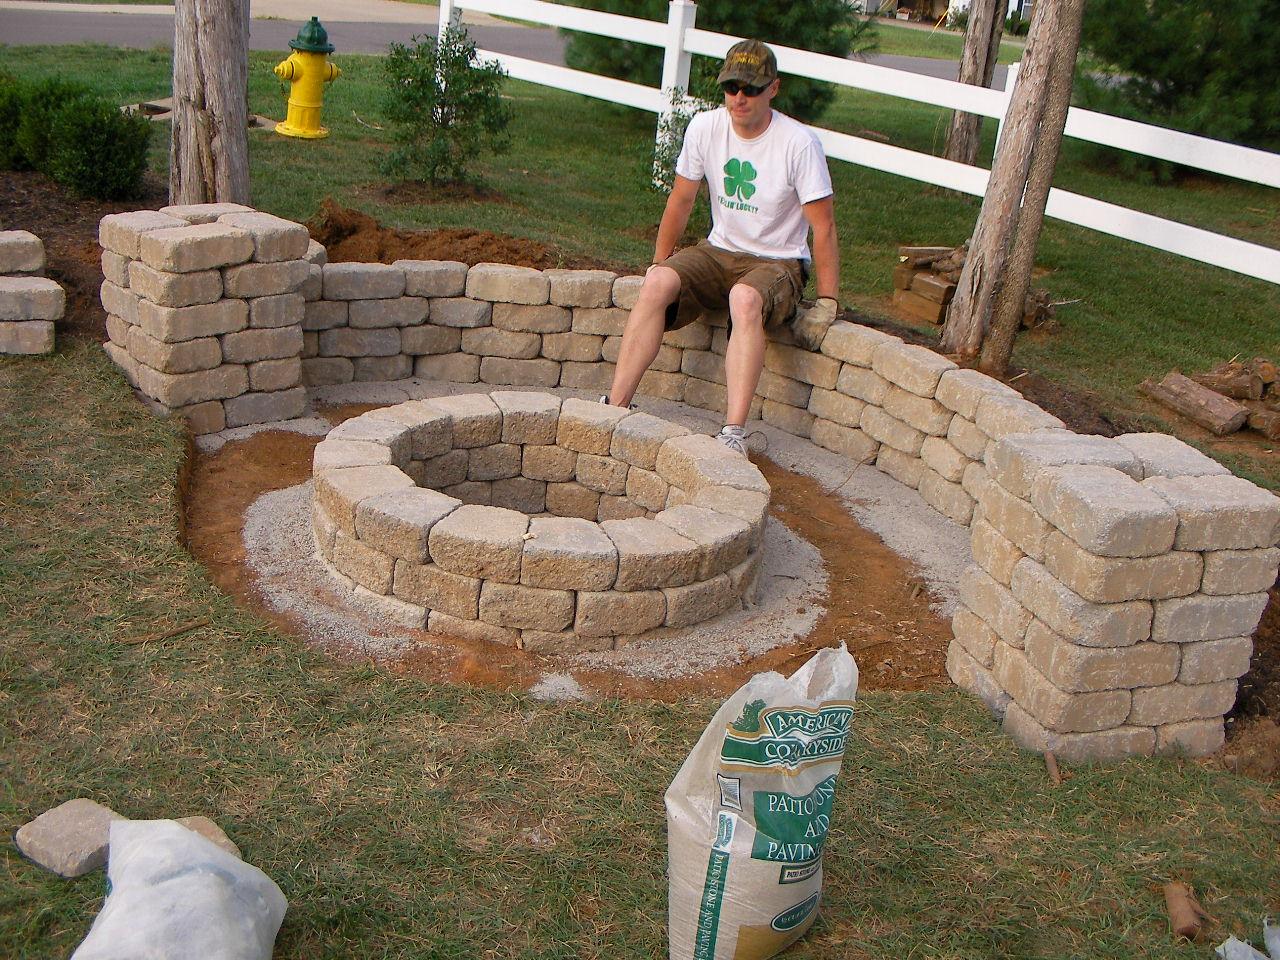 Backyard Fire Pit Ideas Diy  DIY Backyard Fire Pit